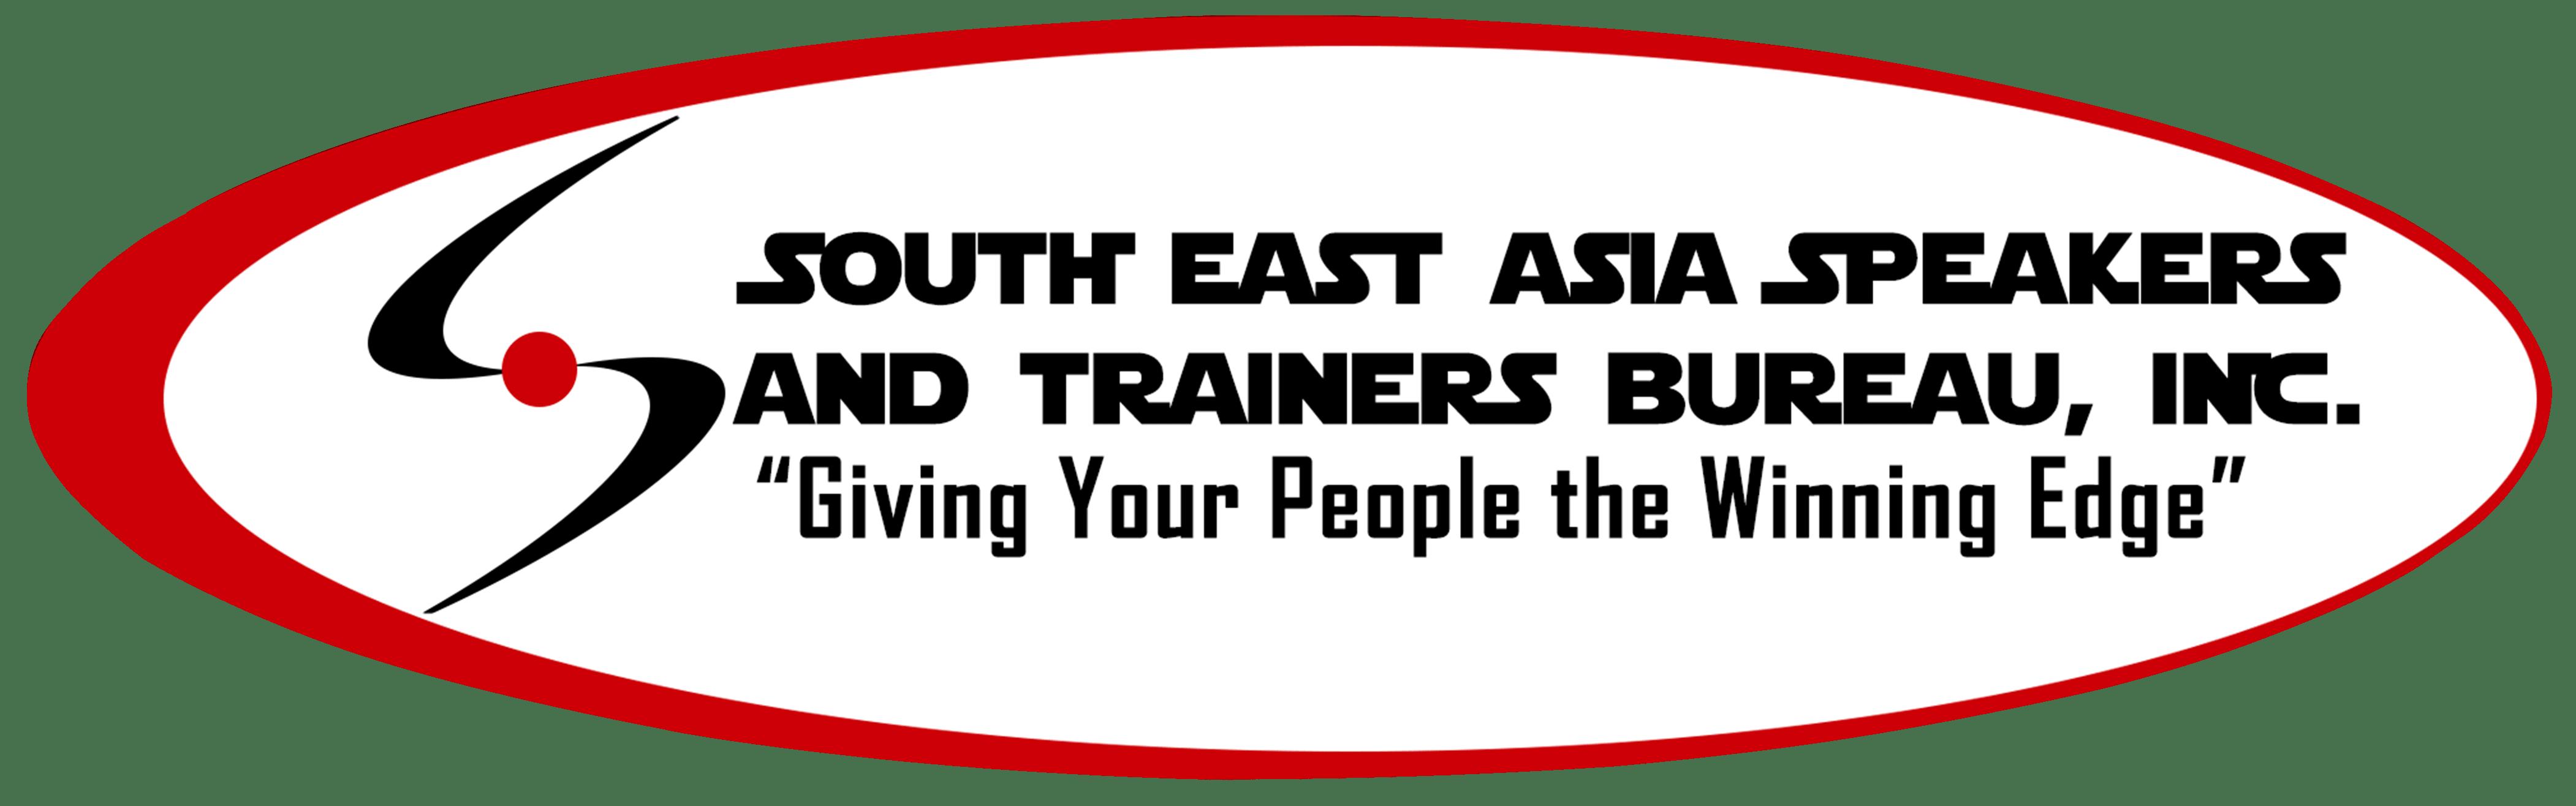 Speakers Bureau Logo – Free Skills Trainings Partner of Workbank